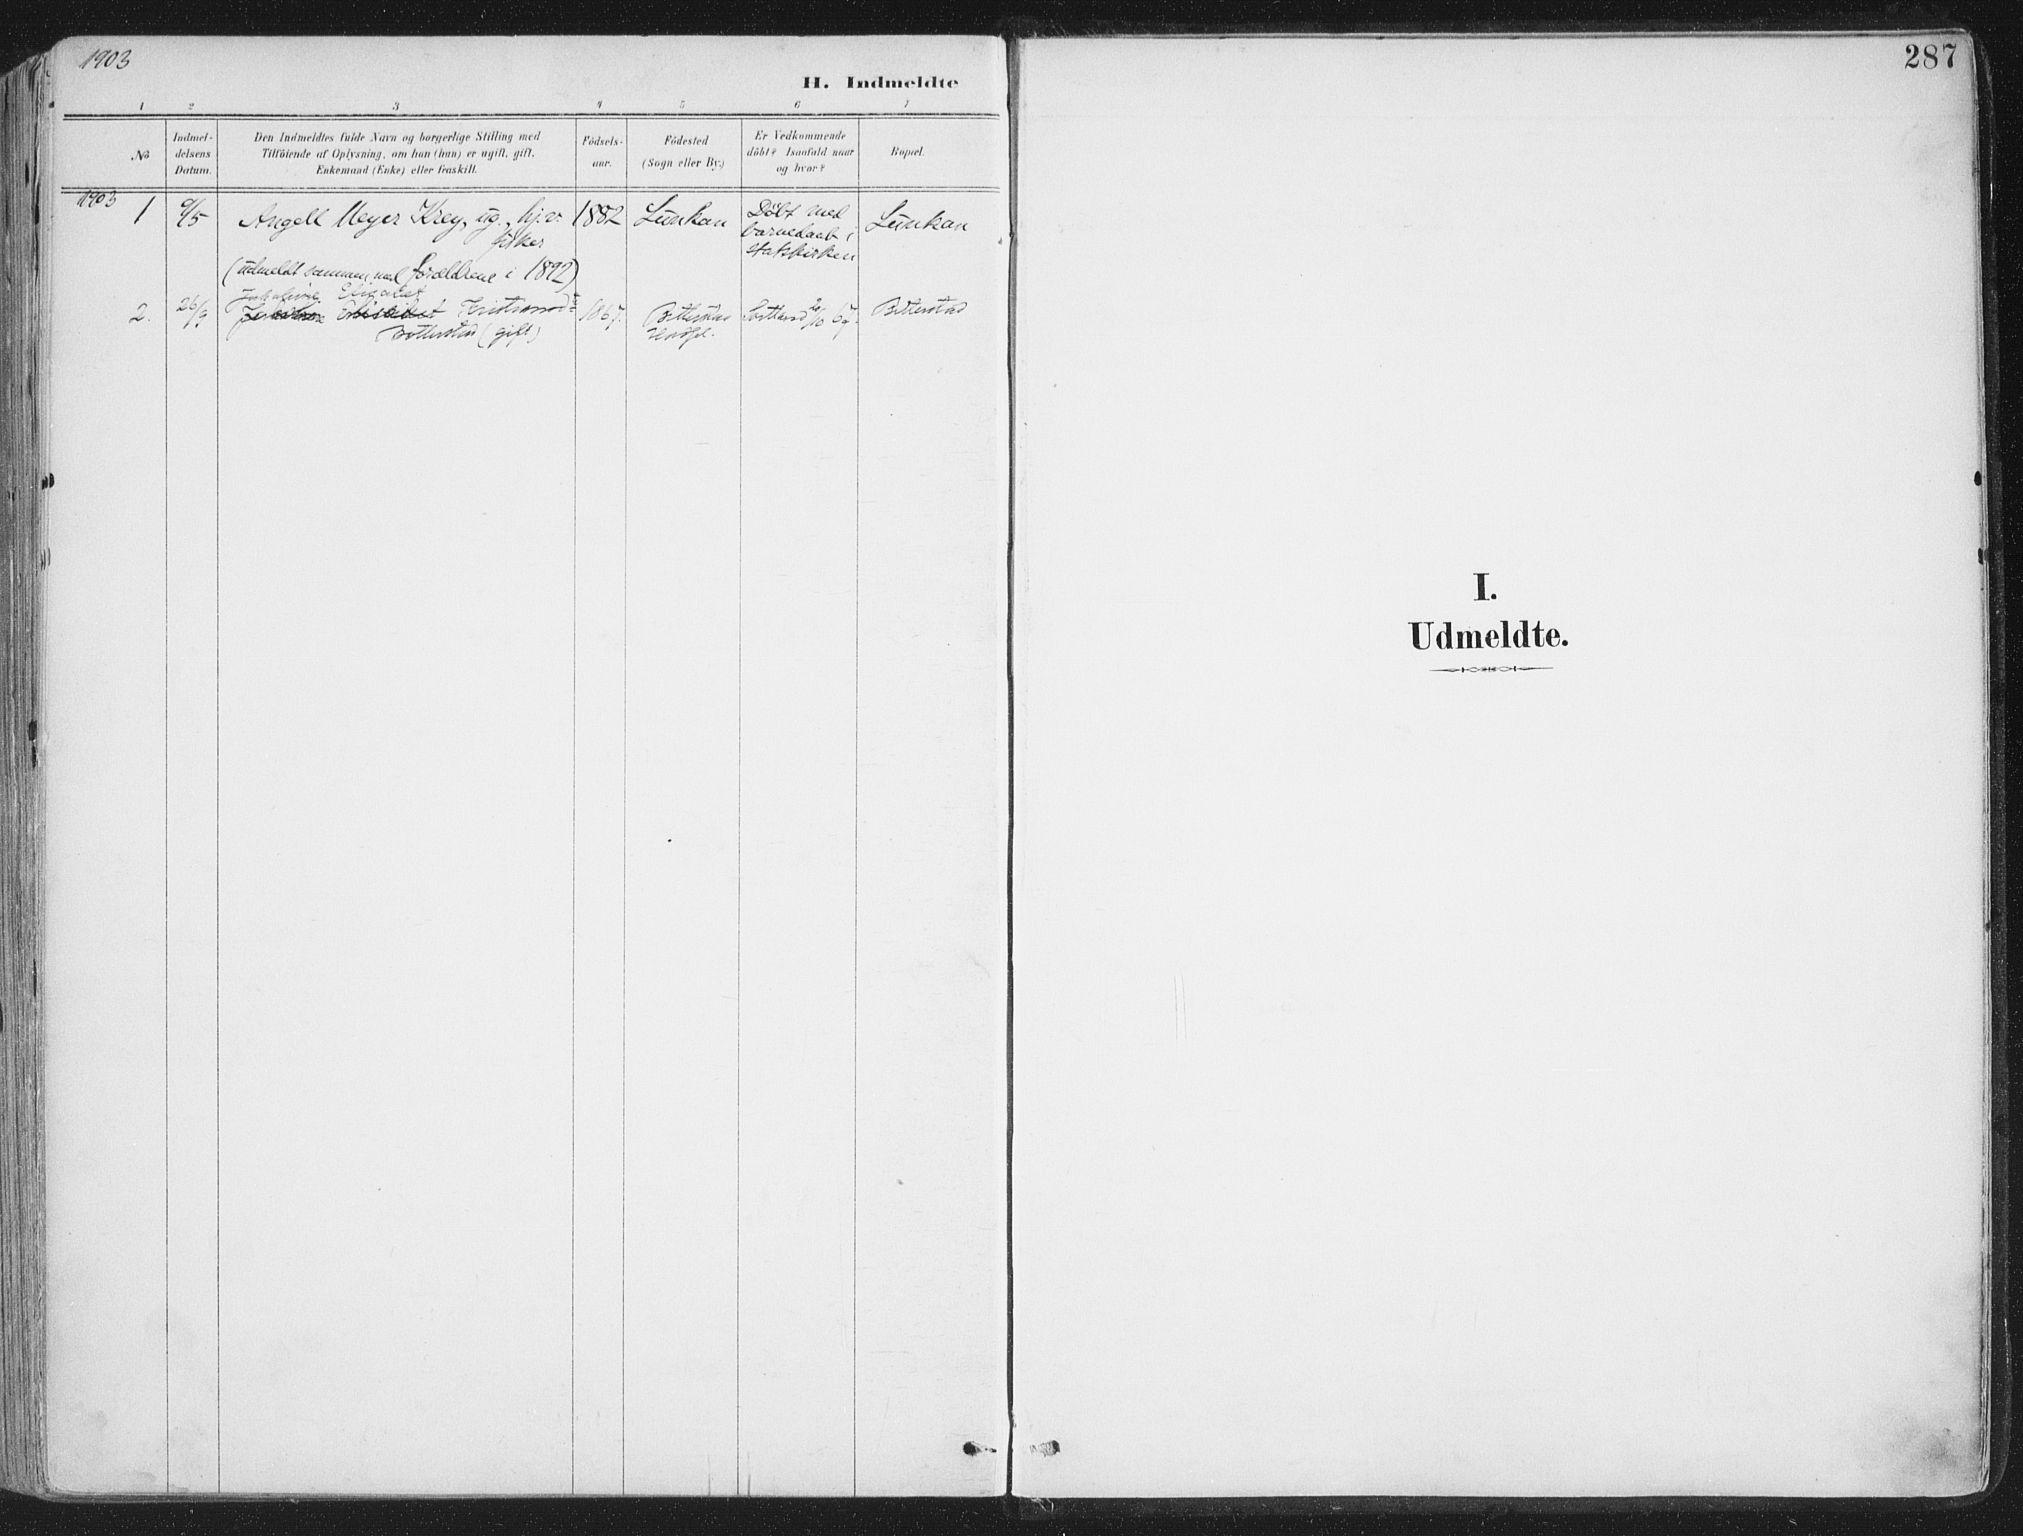 SAT, Ministerialprotokoller, klokkerbøker og fødselsregistre - Nordland, 888/L1246: Ministerialbok nr. 888A12, 1891-1903, s. 287